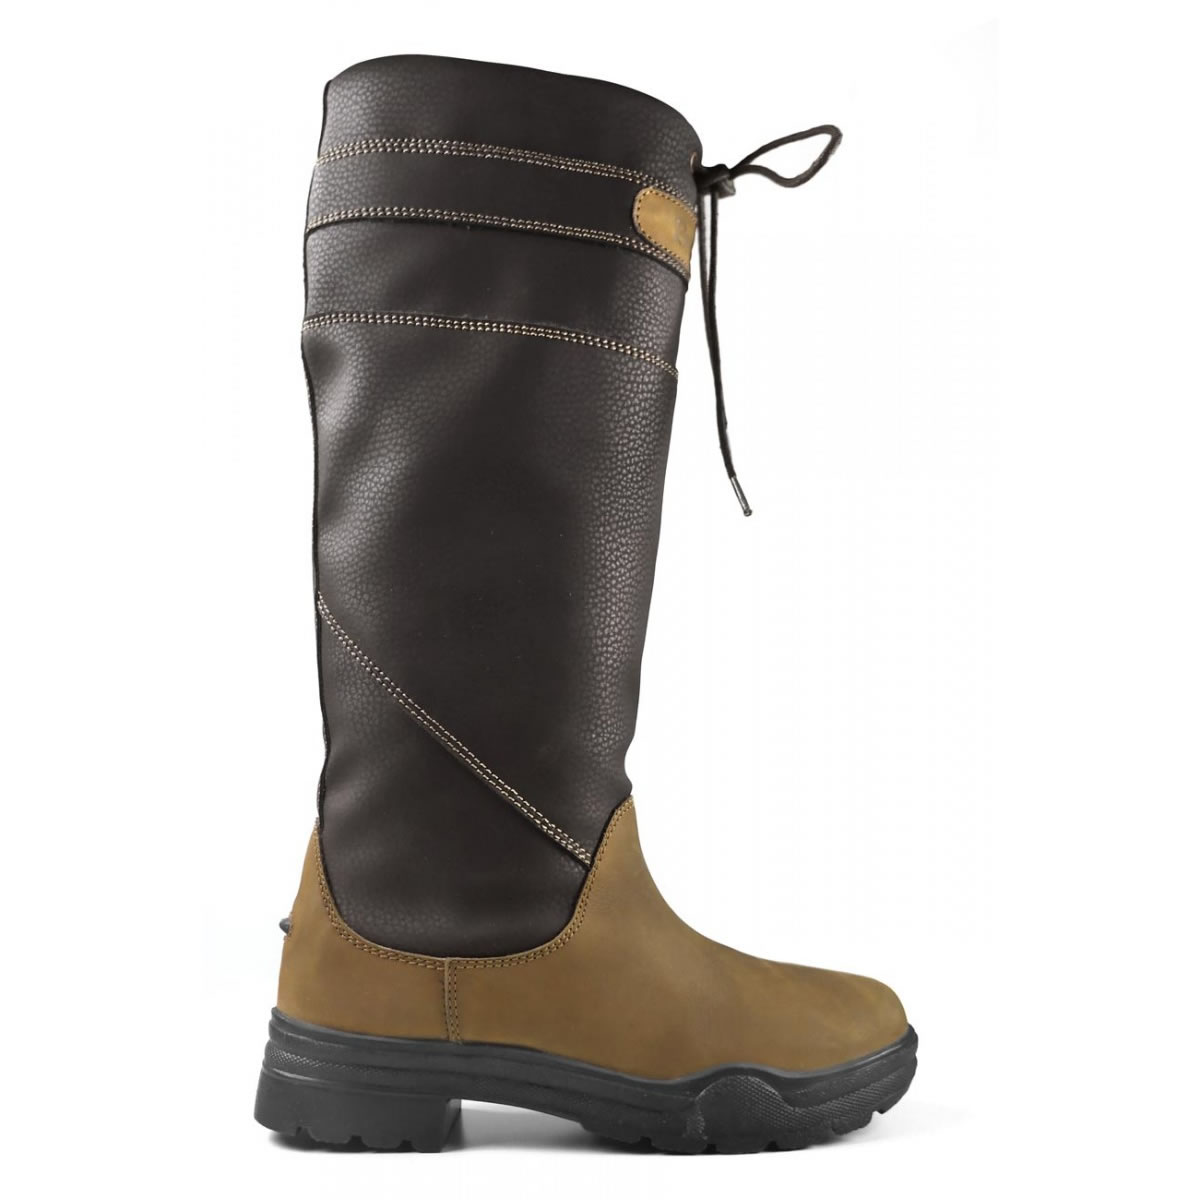 3508e46a Brogini Derbyshire Kids BootsFrom £66.00 (£55.00 +VAT)